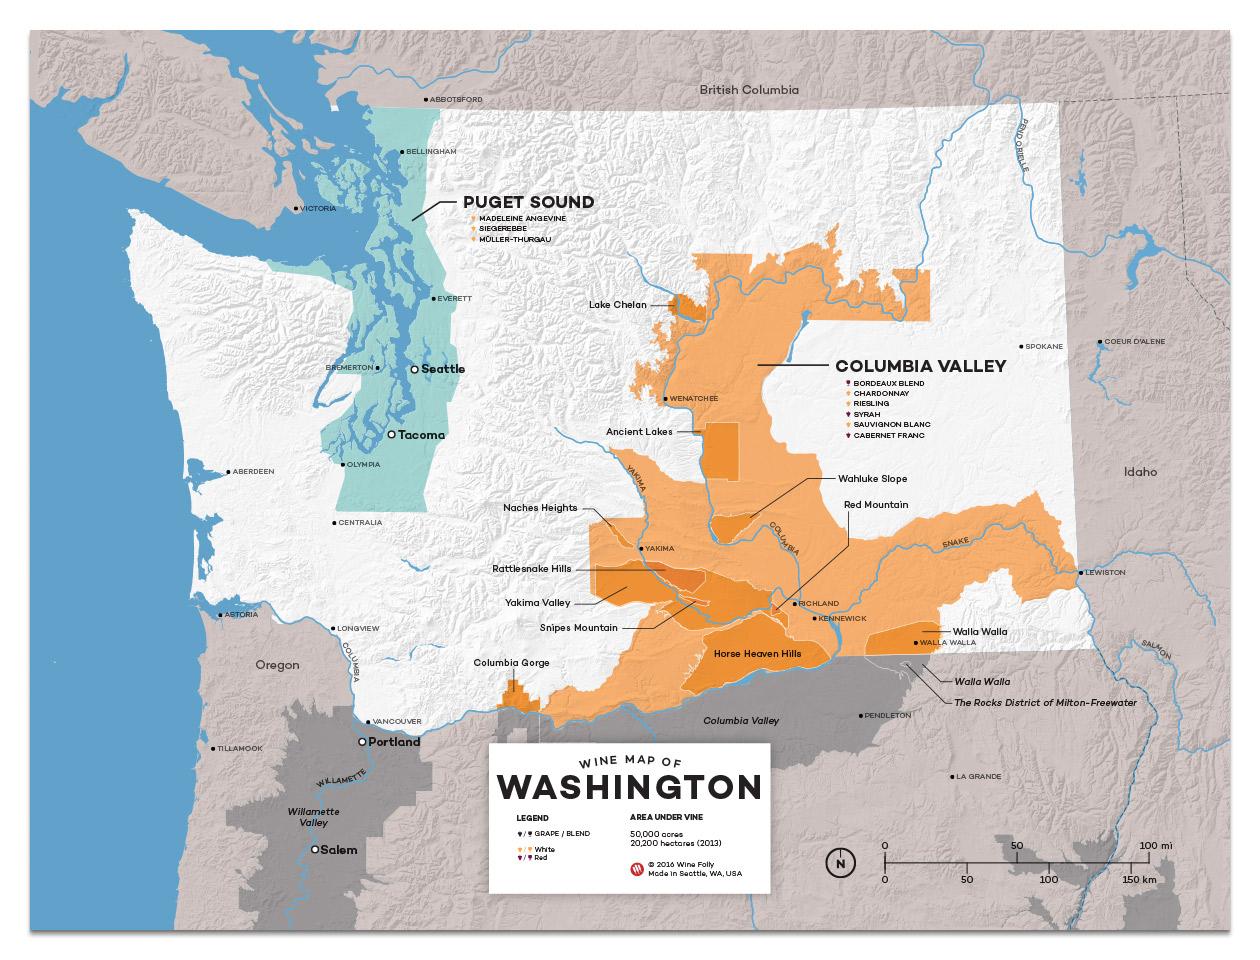 Wine Regions of Washington Regional Map by Wine Folly - 12x16